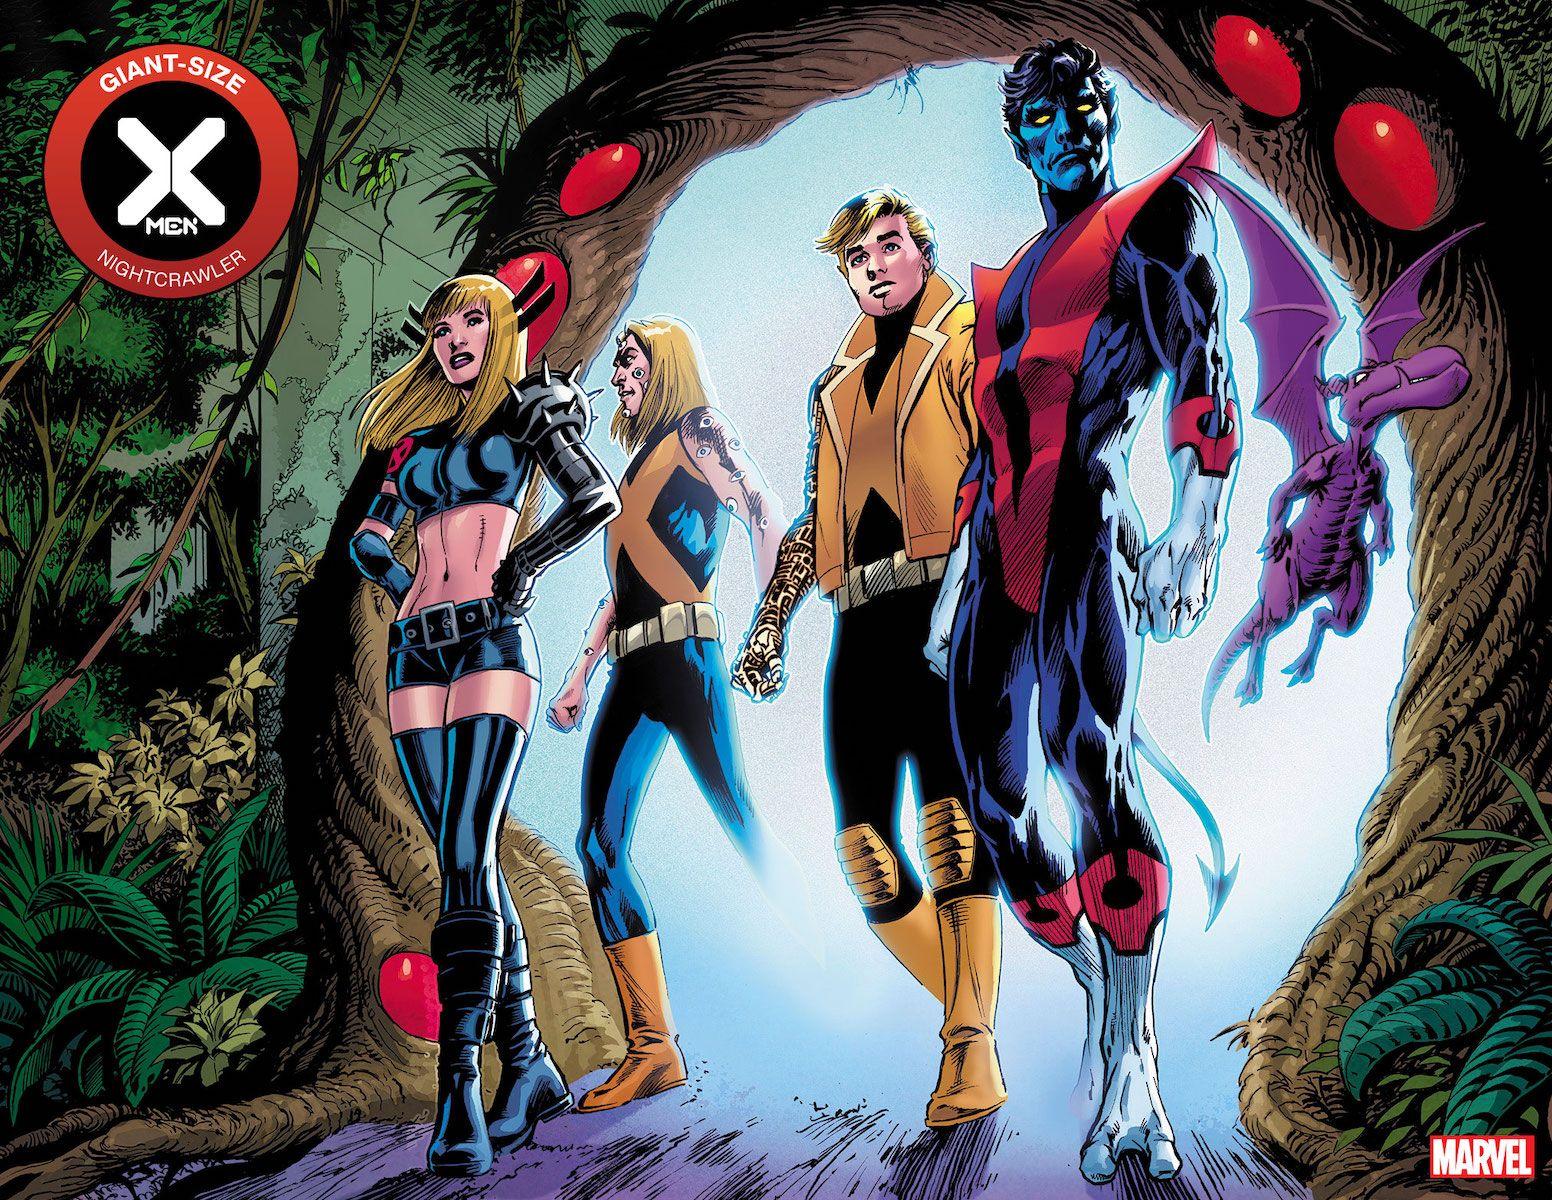 Marvel X Men C2e2 20 Panel Art In 2020 Marvel Women Xmen Comics Nightcrawler